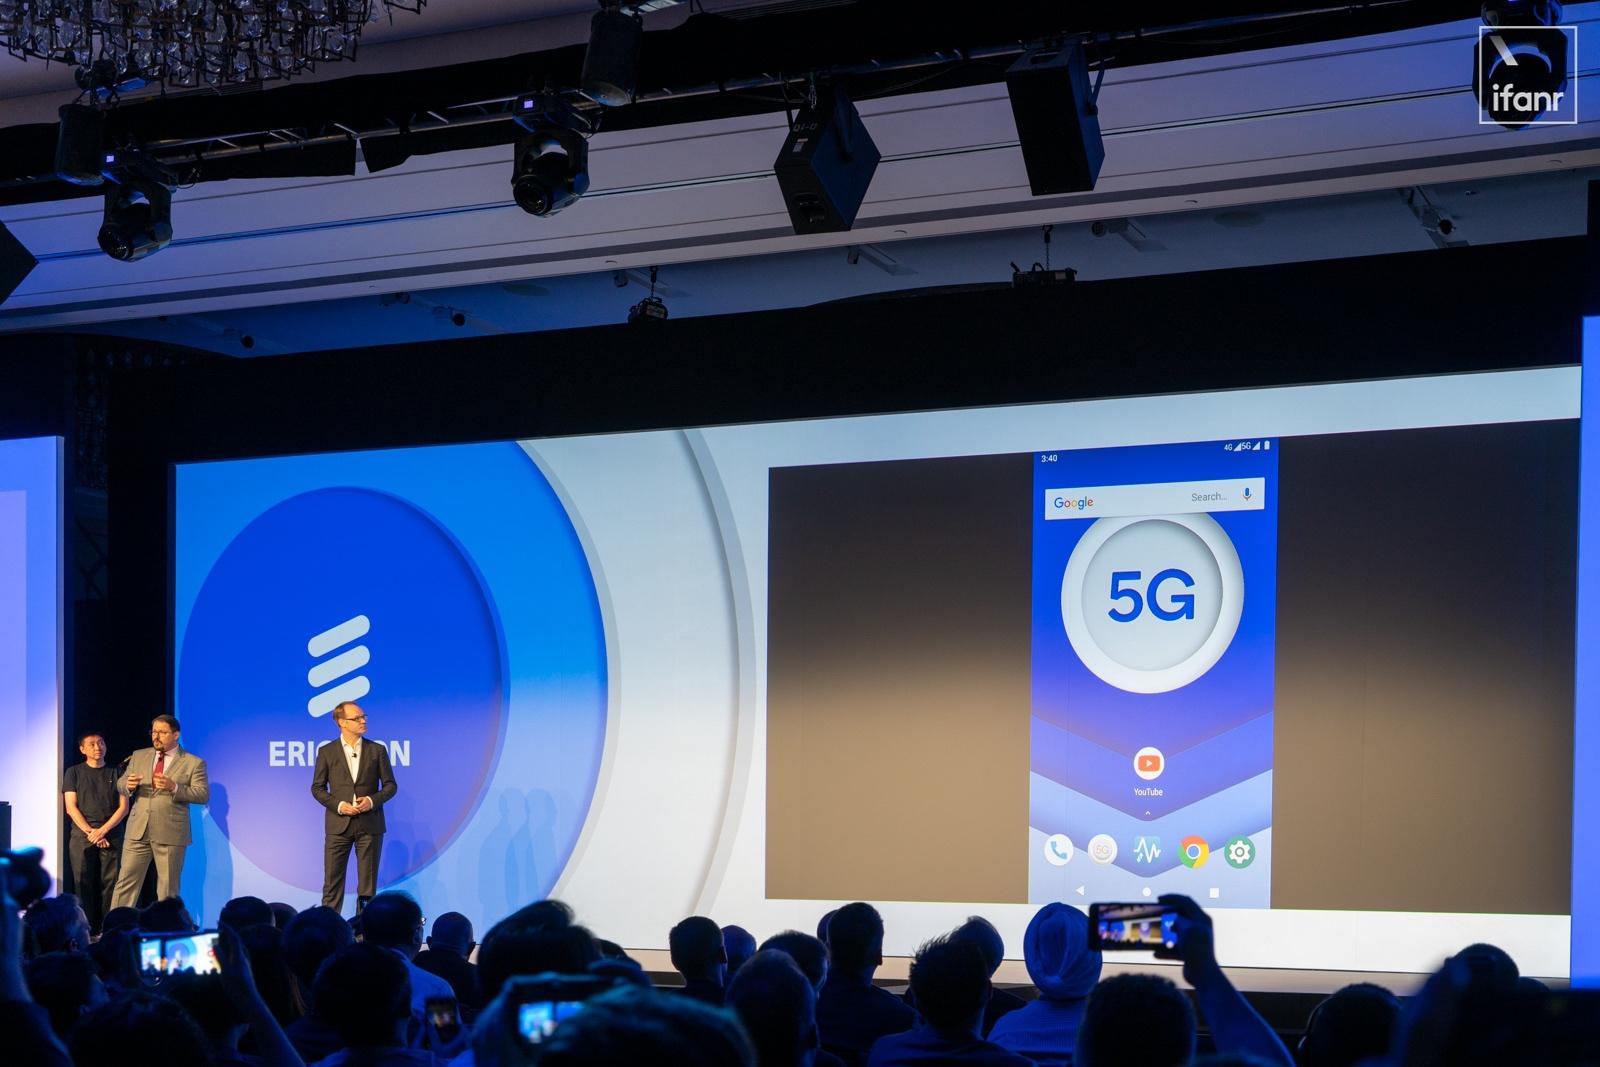 5G 时代的高通,想要覆盖 1000 亿美元的广阔市场  移动互联  第7张